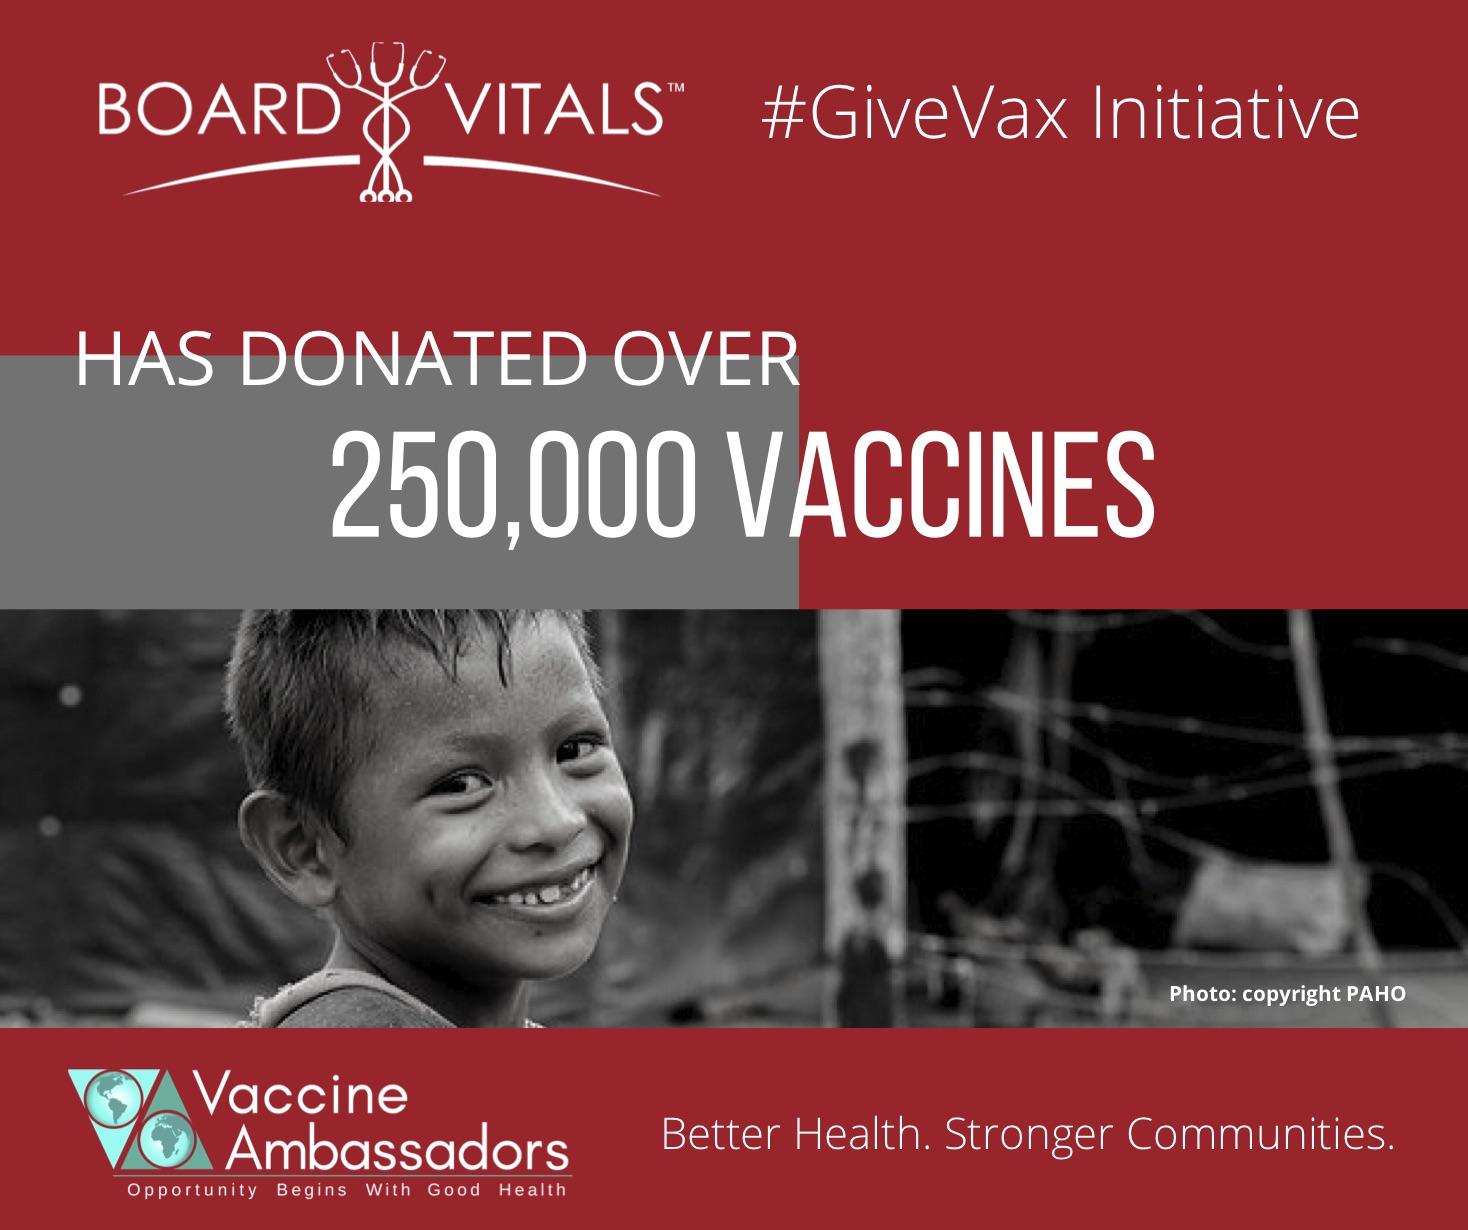 BoardVitals Celebrates 250,000 Vaccines